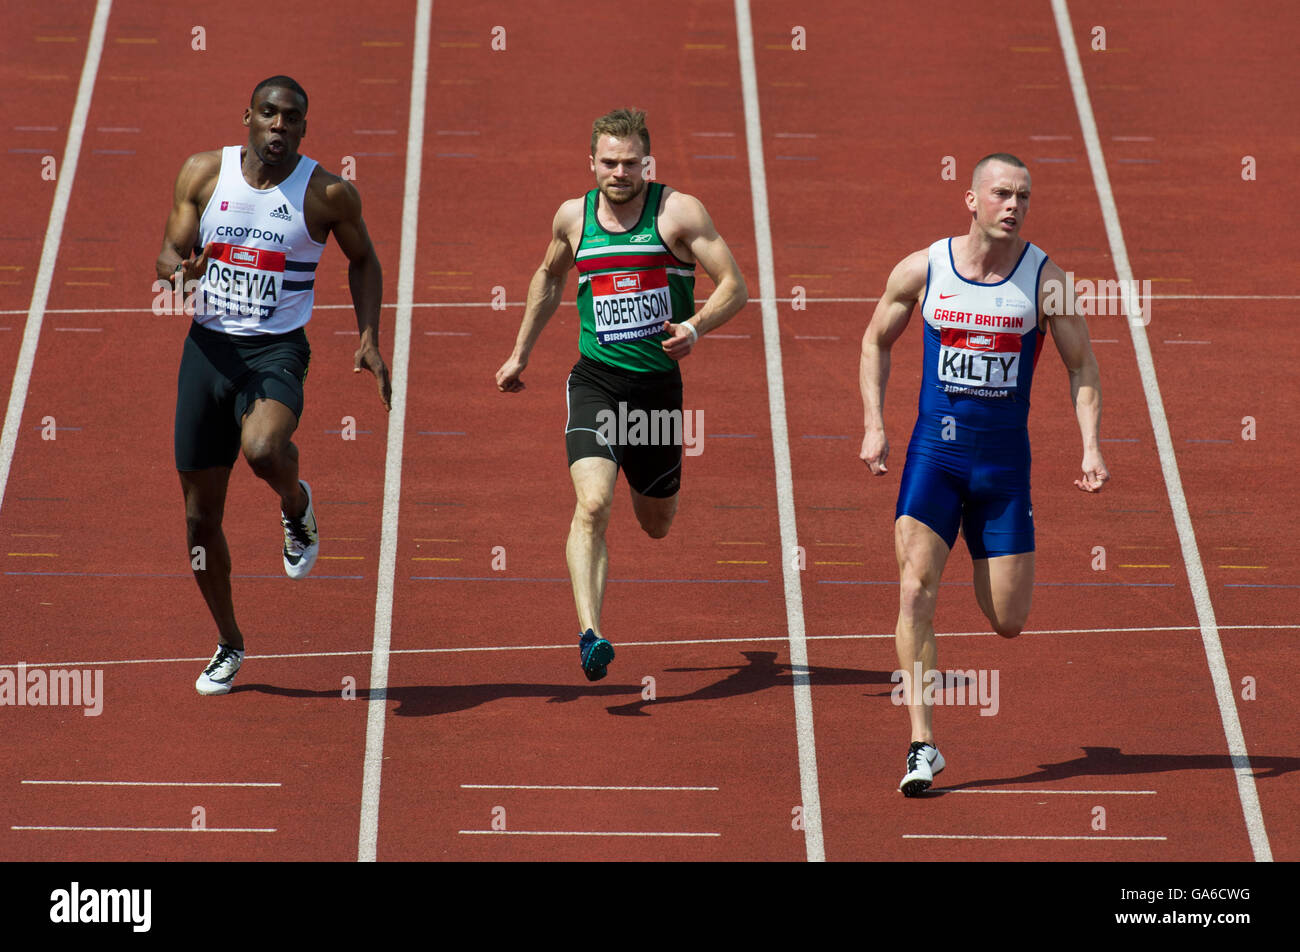 Birmingham 25th June 2016, Sam Osewa (L)_ Andrew Robertson (M) _ Richard Kilty (R) competing in the Men's 100m - Stock Image